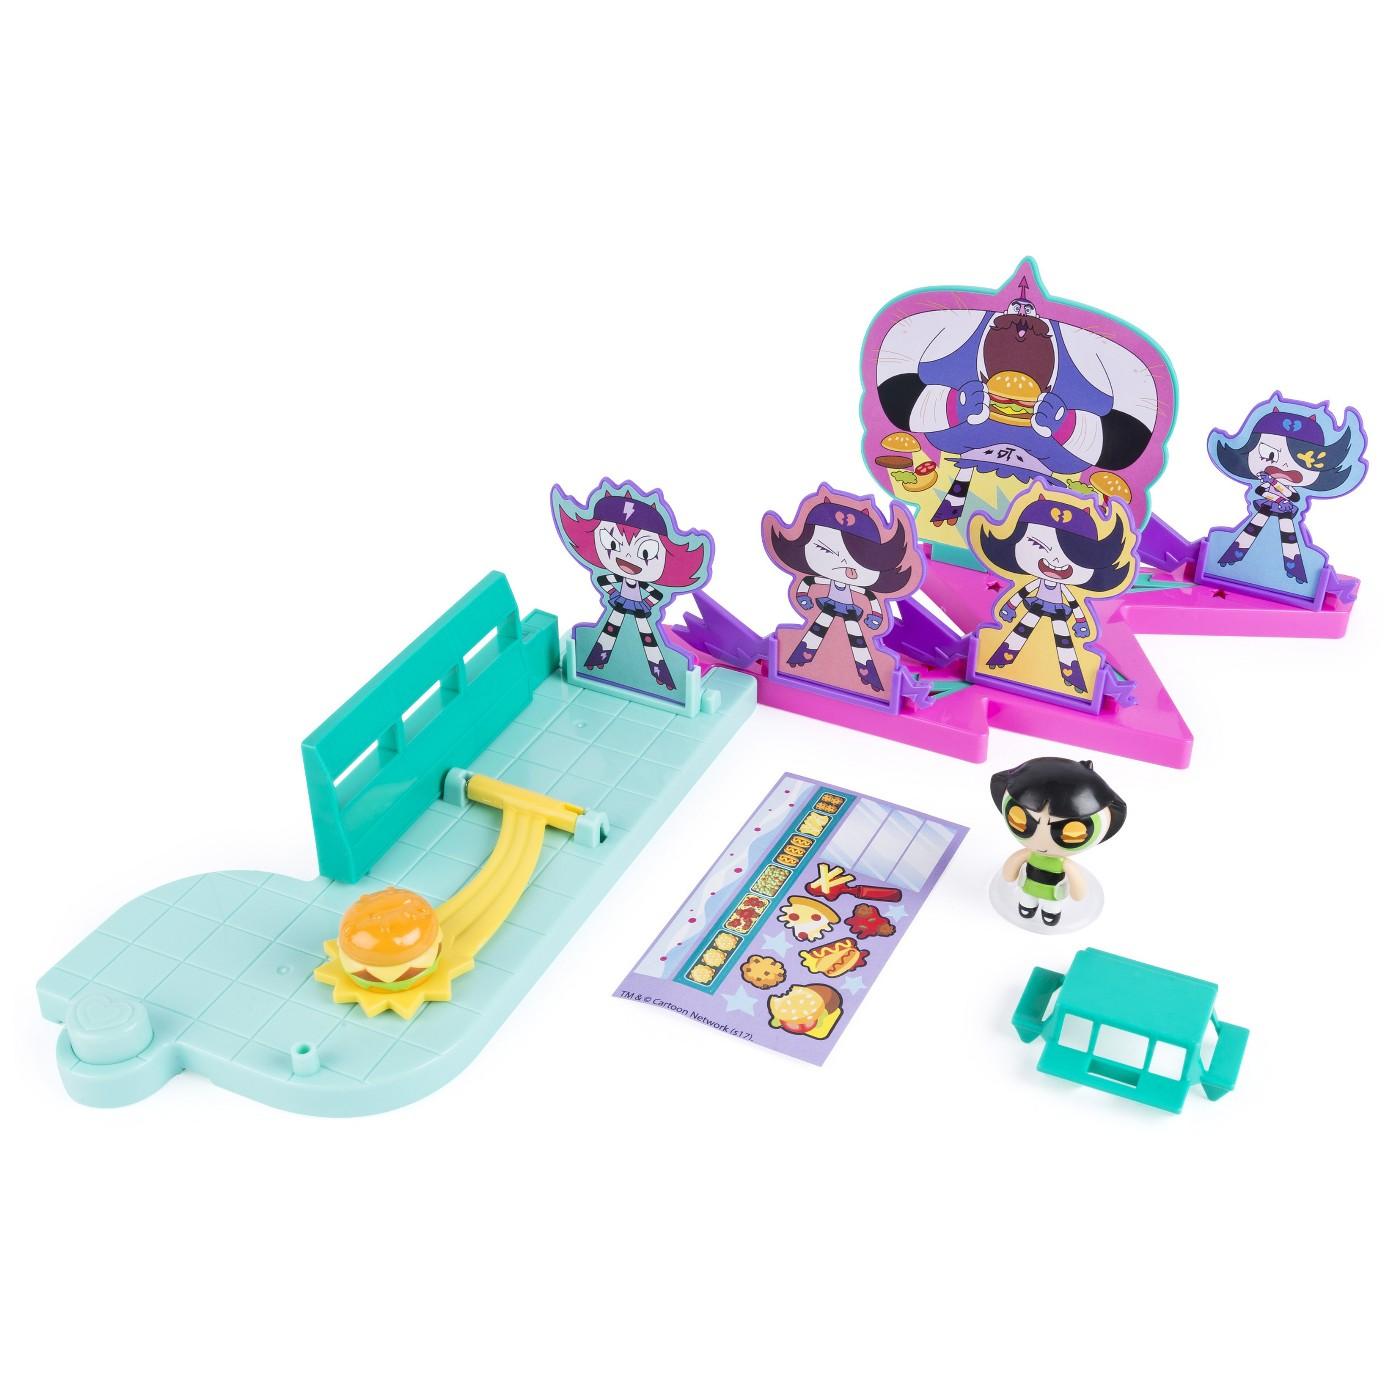 SM120223230000POWERPUFF GIRLS STORYMAKER PLAYSET (4)